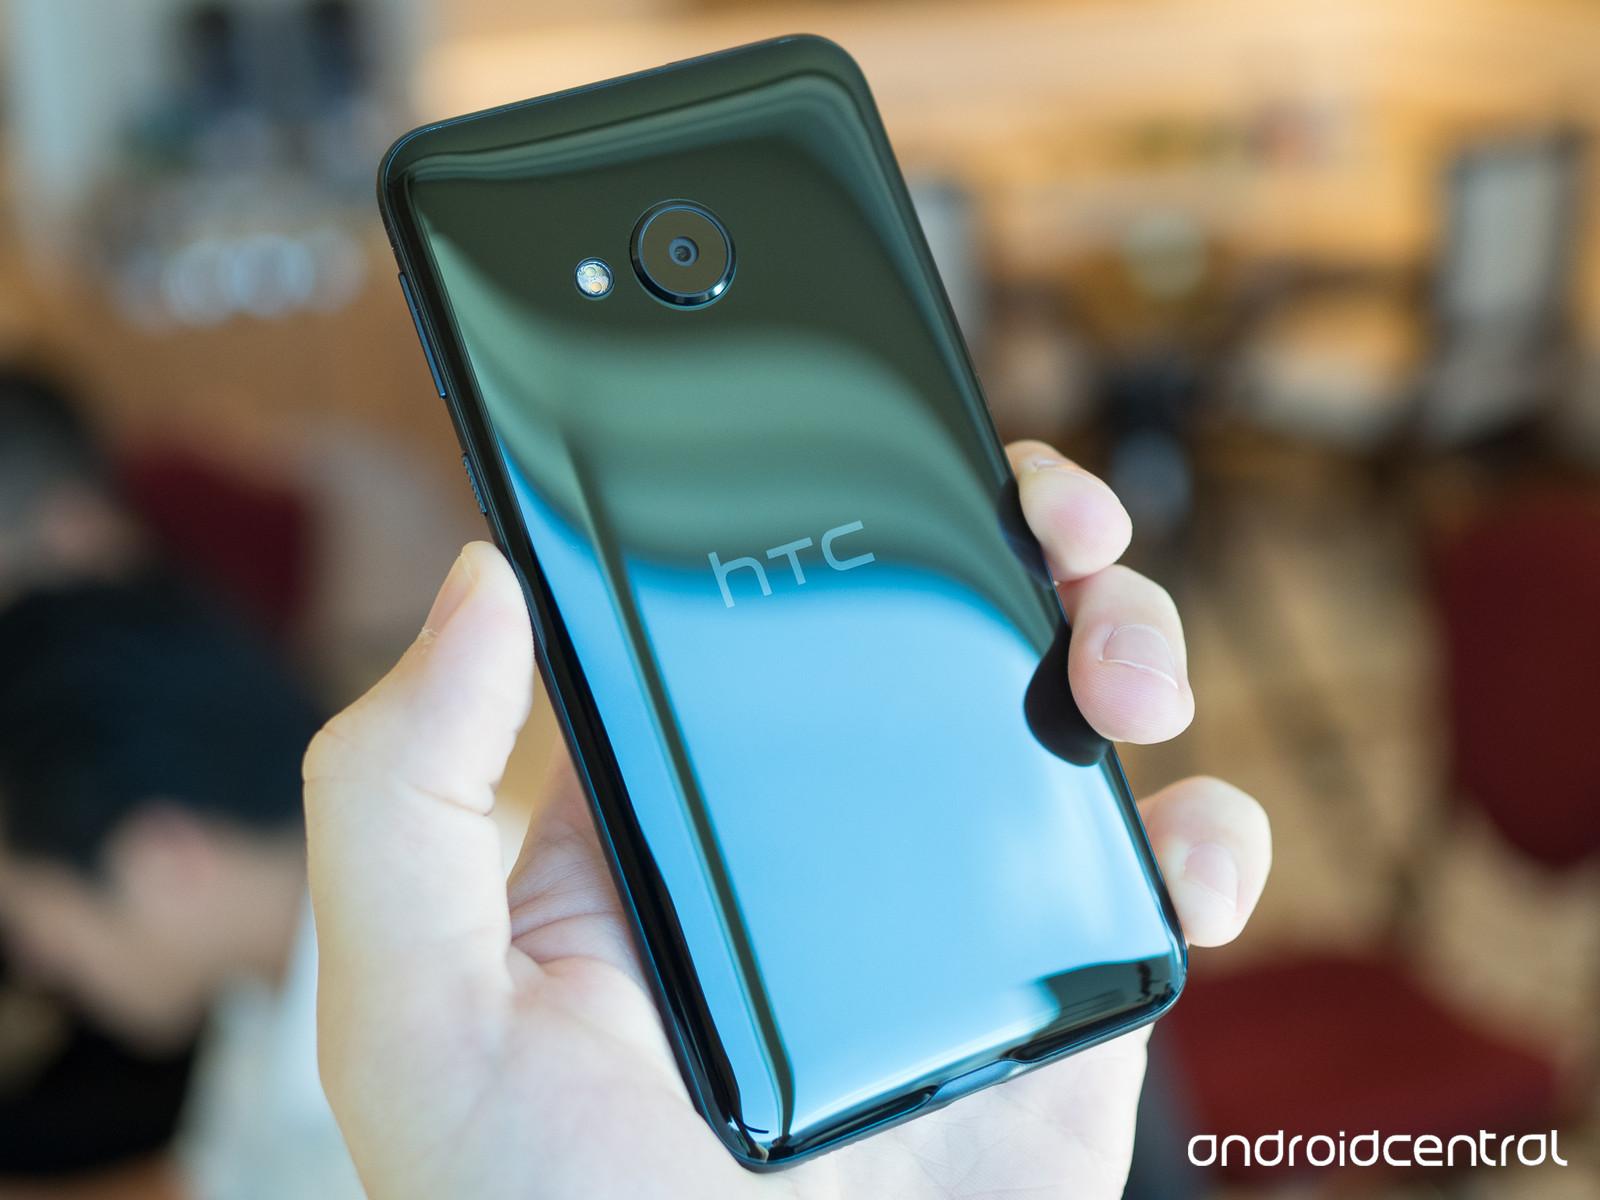 HTC ���ļ��Ⱦ����� 1 ����Ԫ������ 7 ������